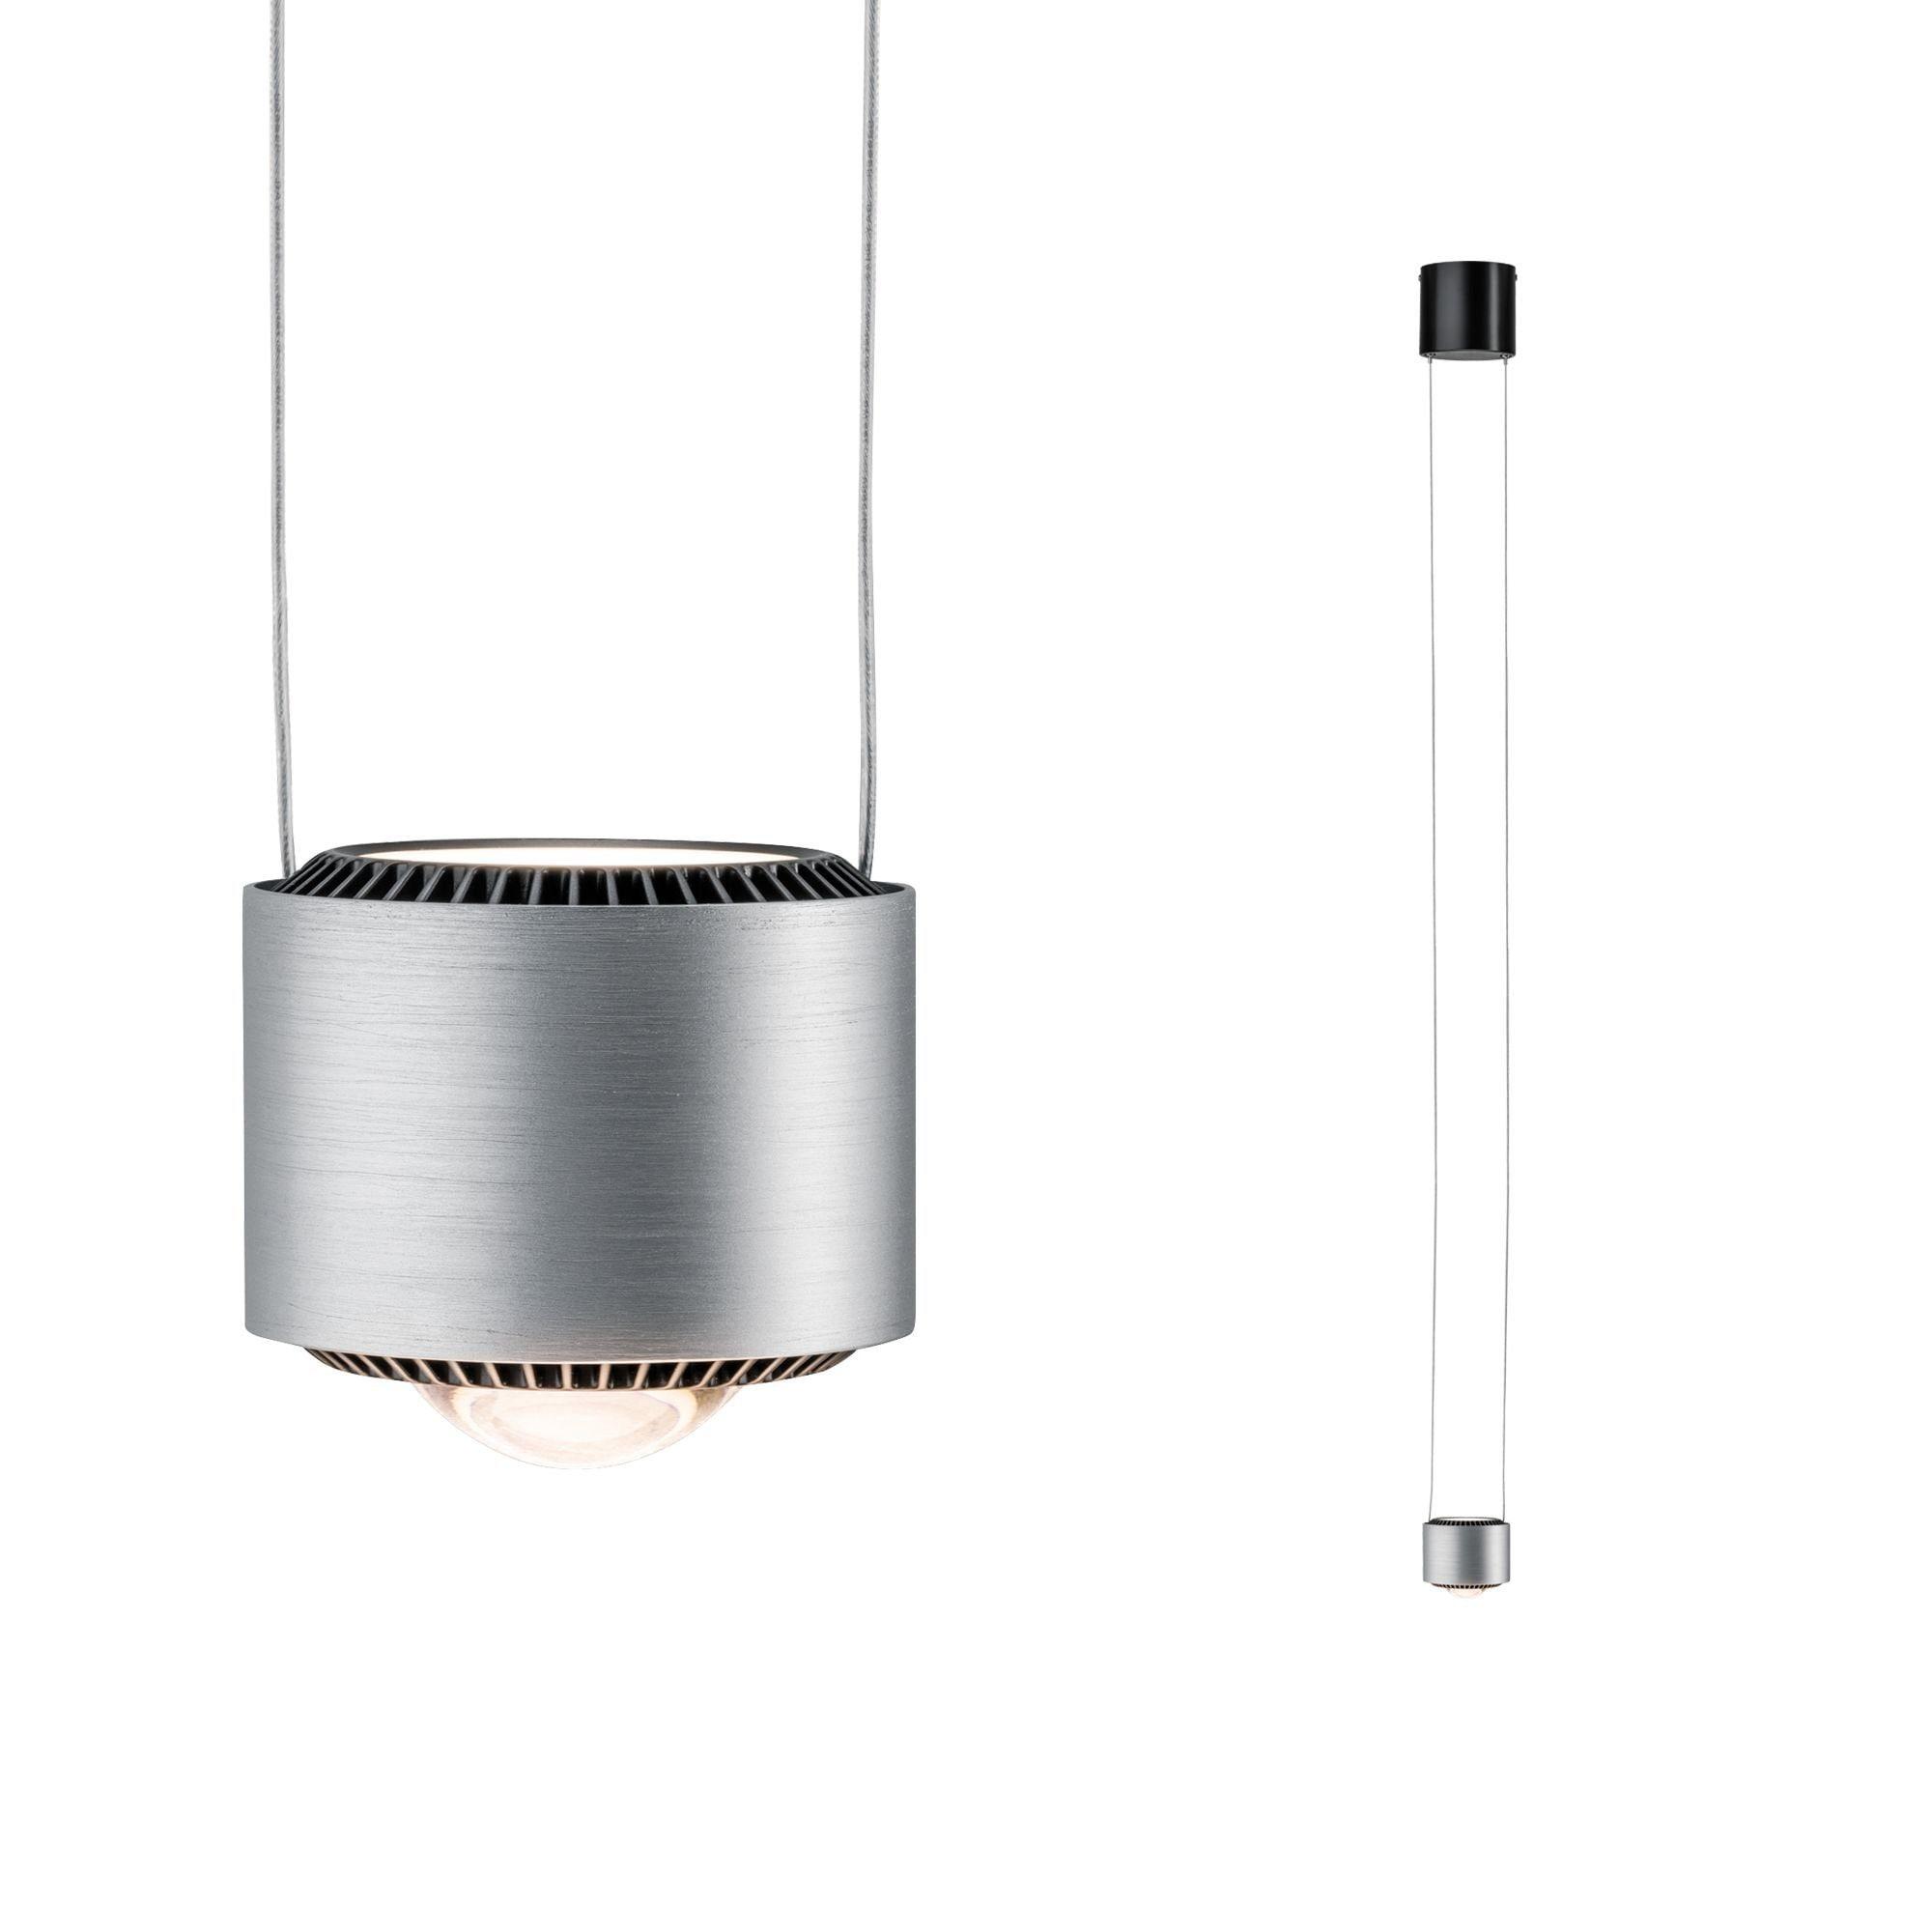 Paulmann LED Pendelleuchte Aldan 13W Schwarz/Alu gebürstet dimmbar, 1 St., Warmweiß